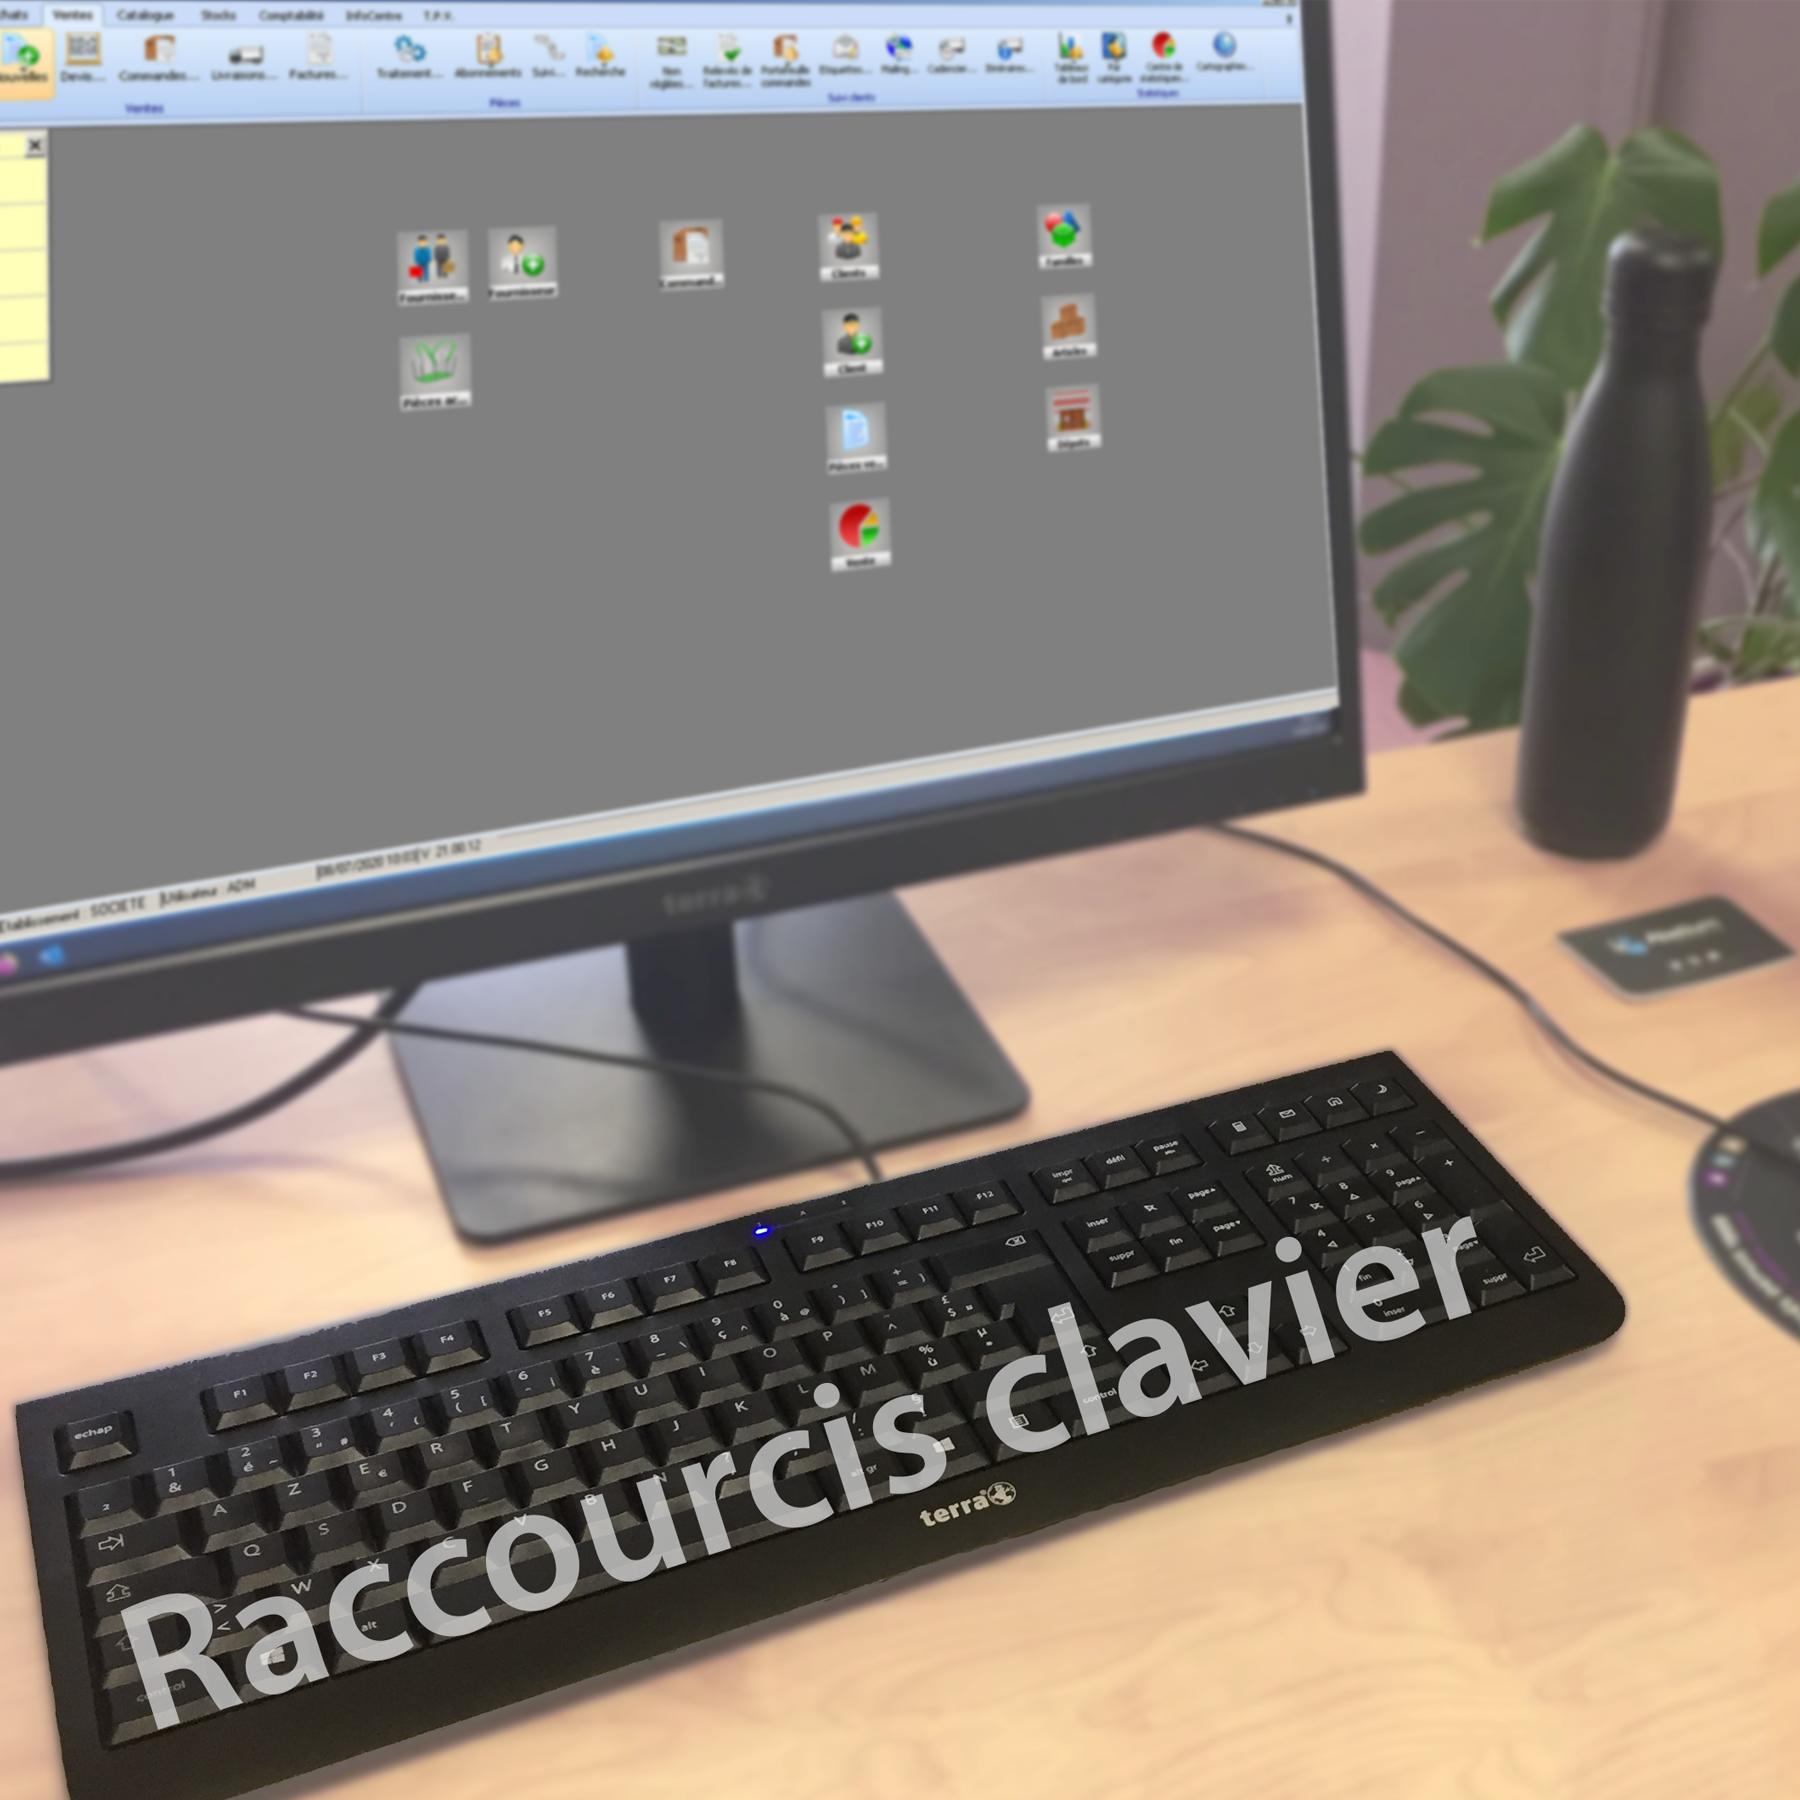 Raccourcis Wavesoft